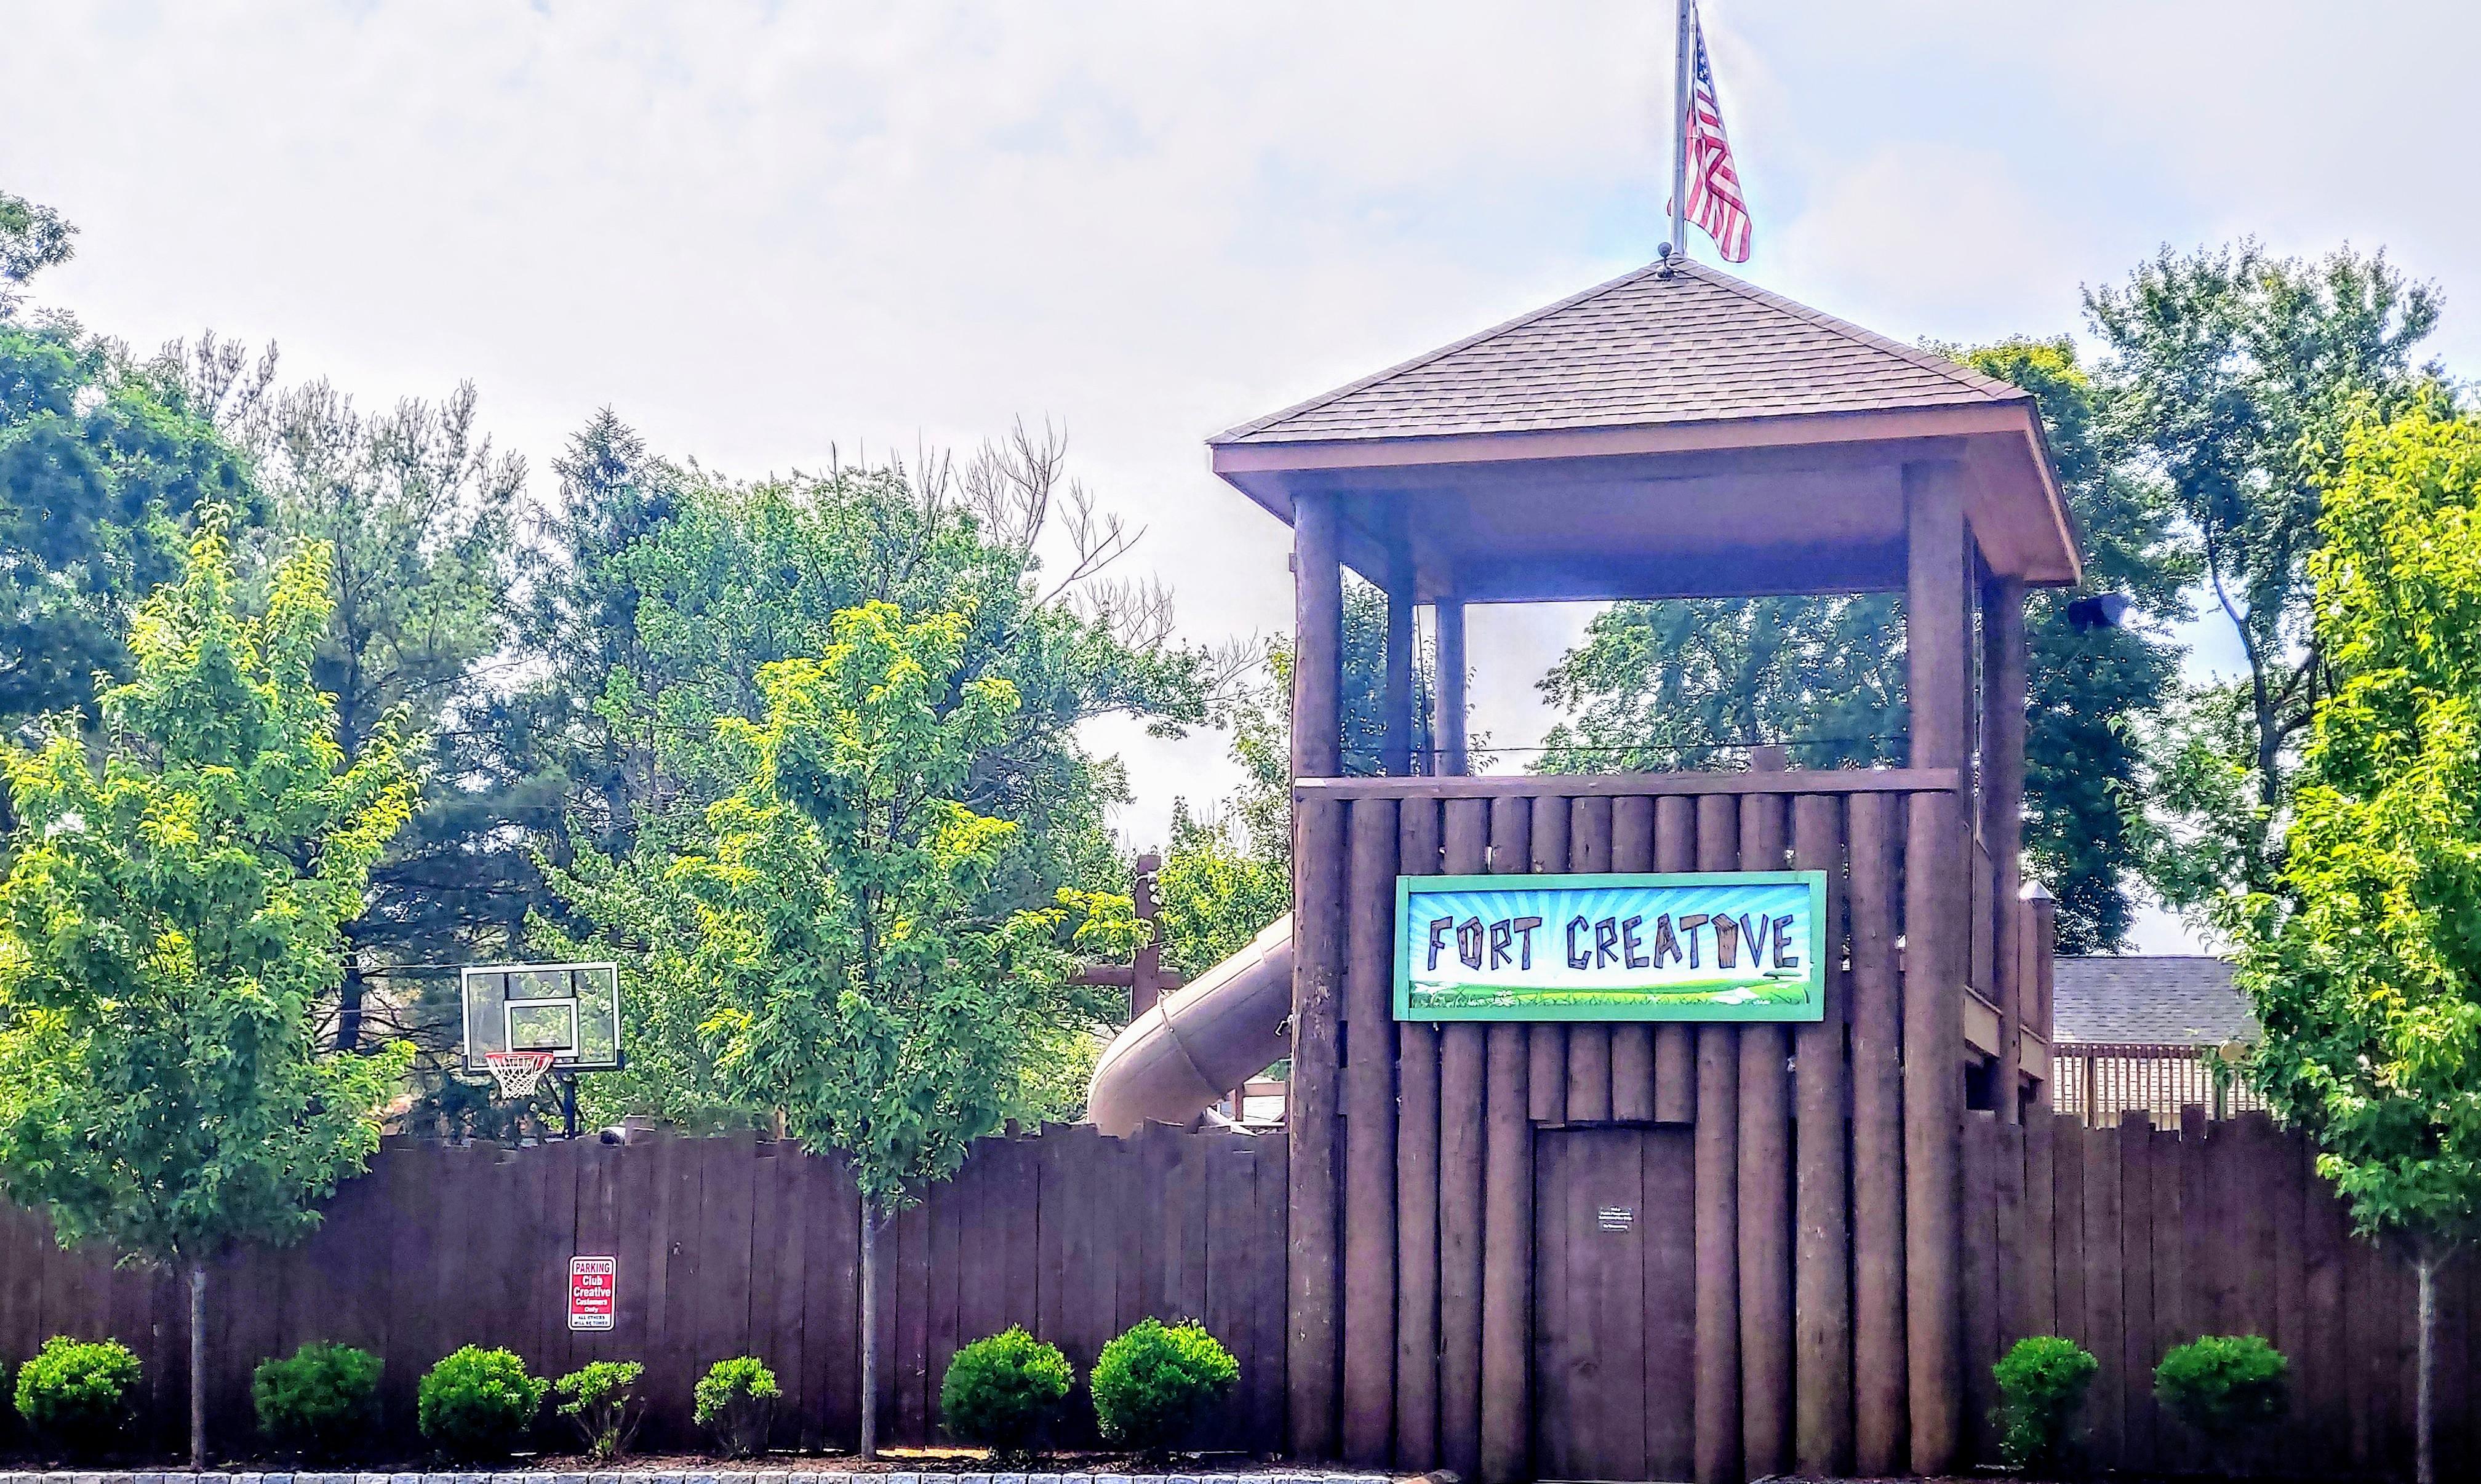 Fort Creative